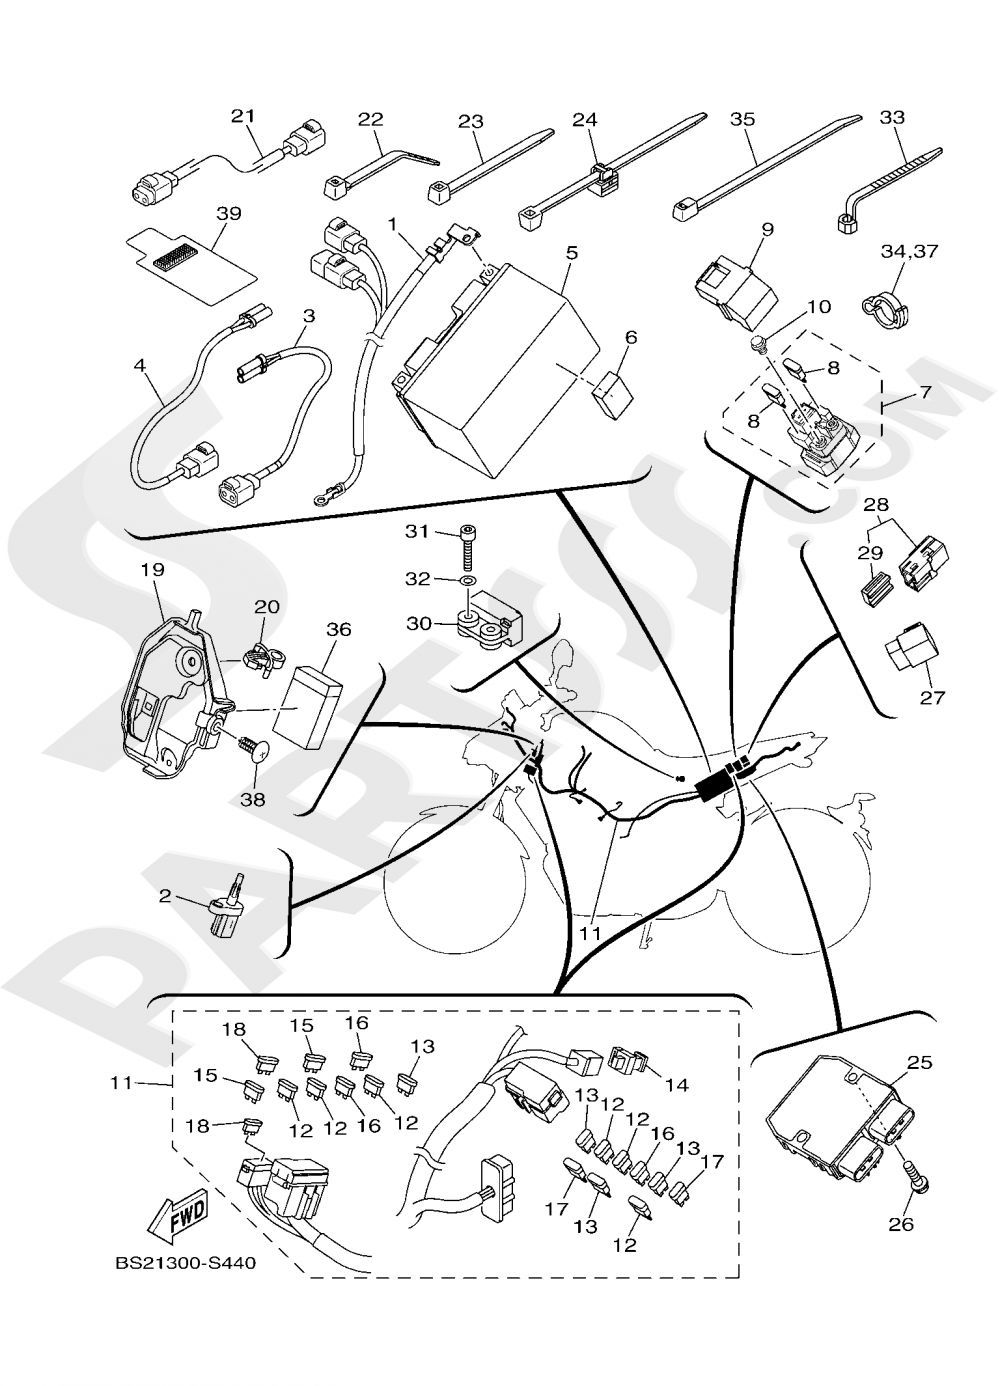 ELECTRICAL 1 Yamaha MT-09 ABS 2020